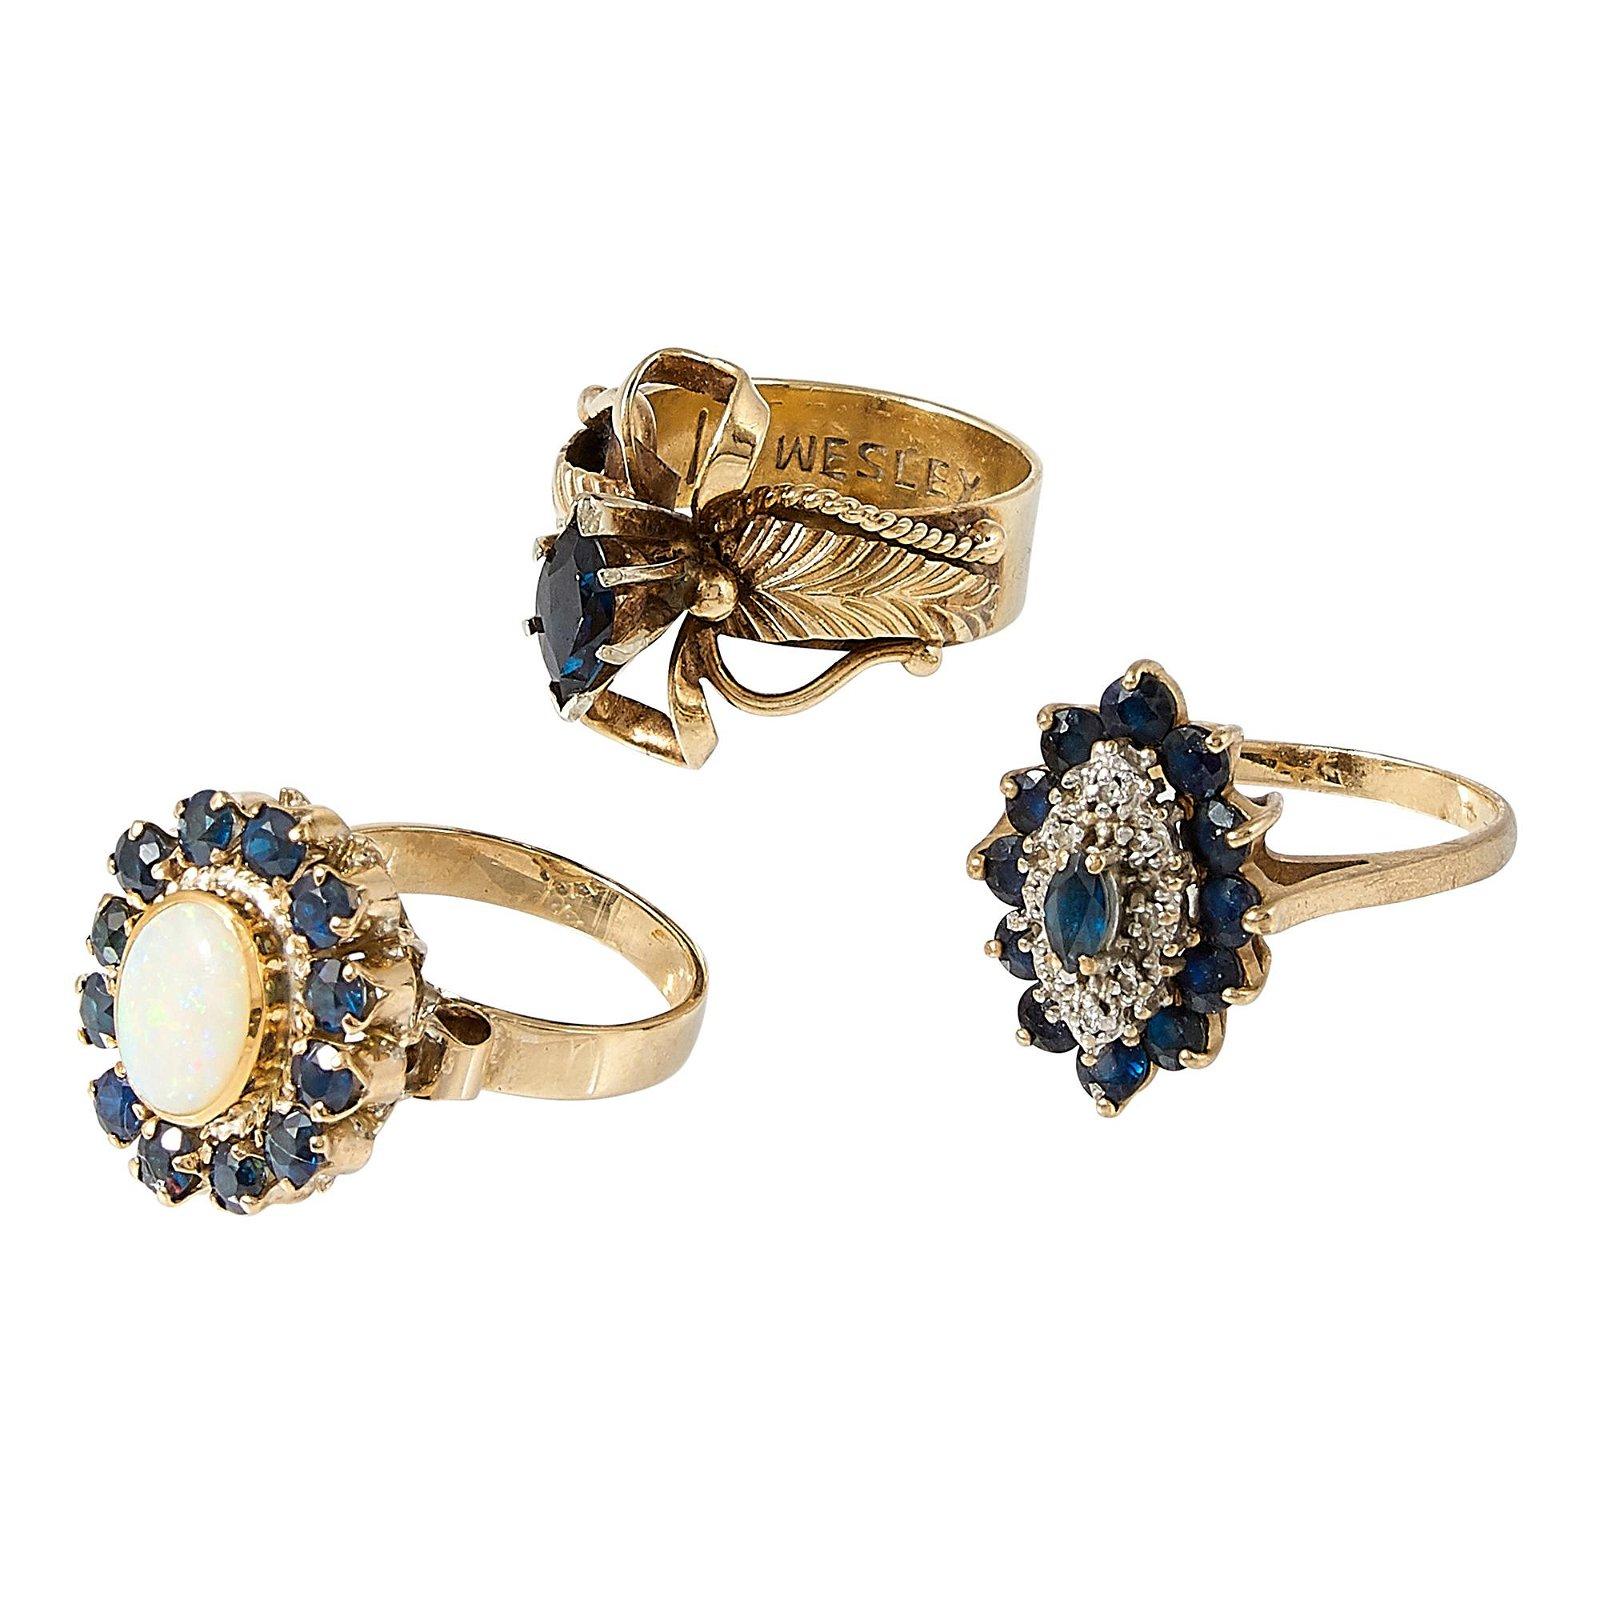 Jewelry Group, 1970s-1980s three rings